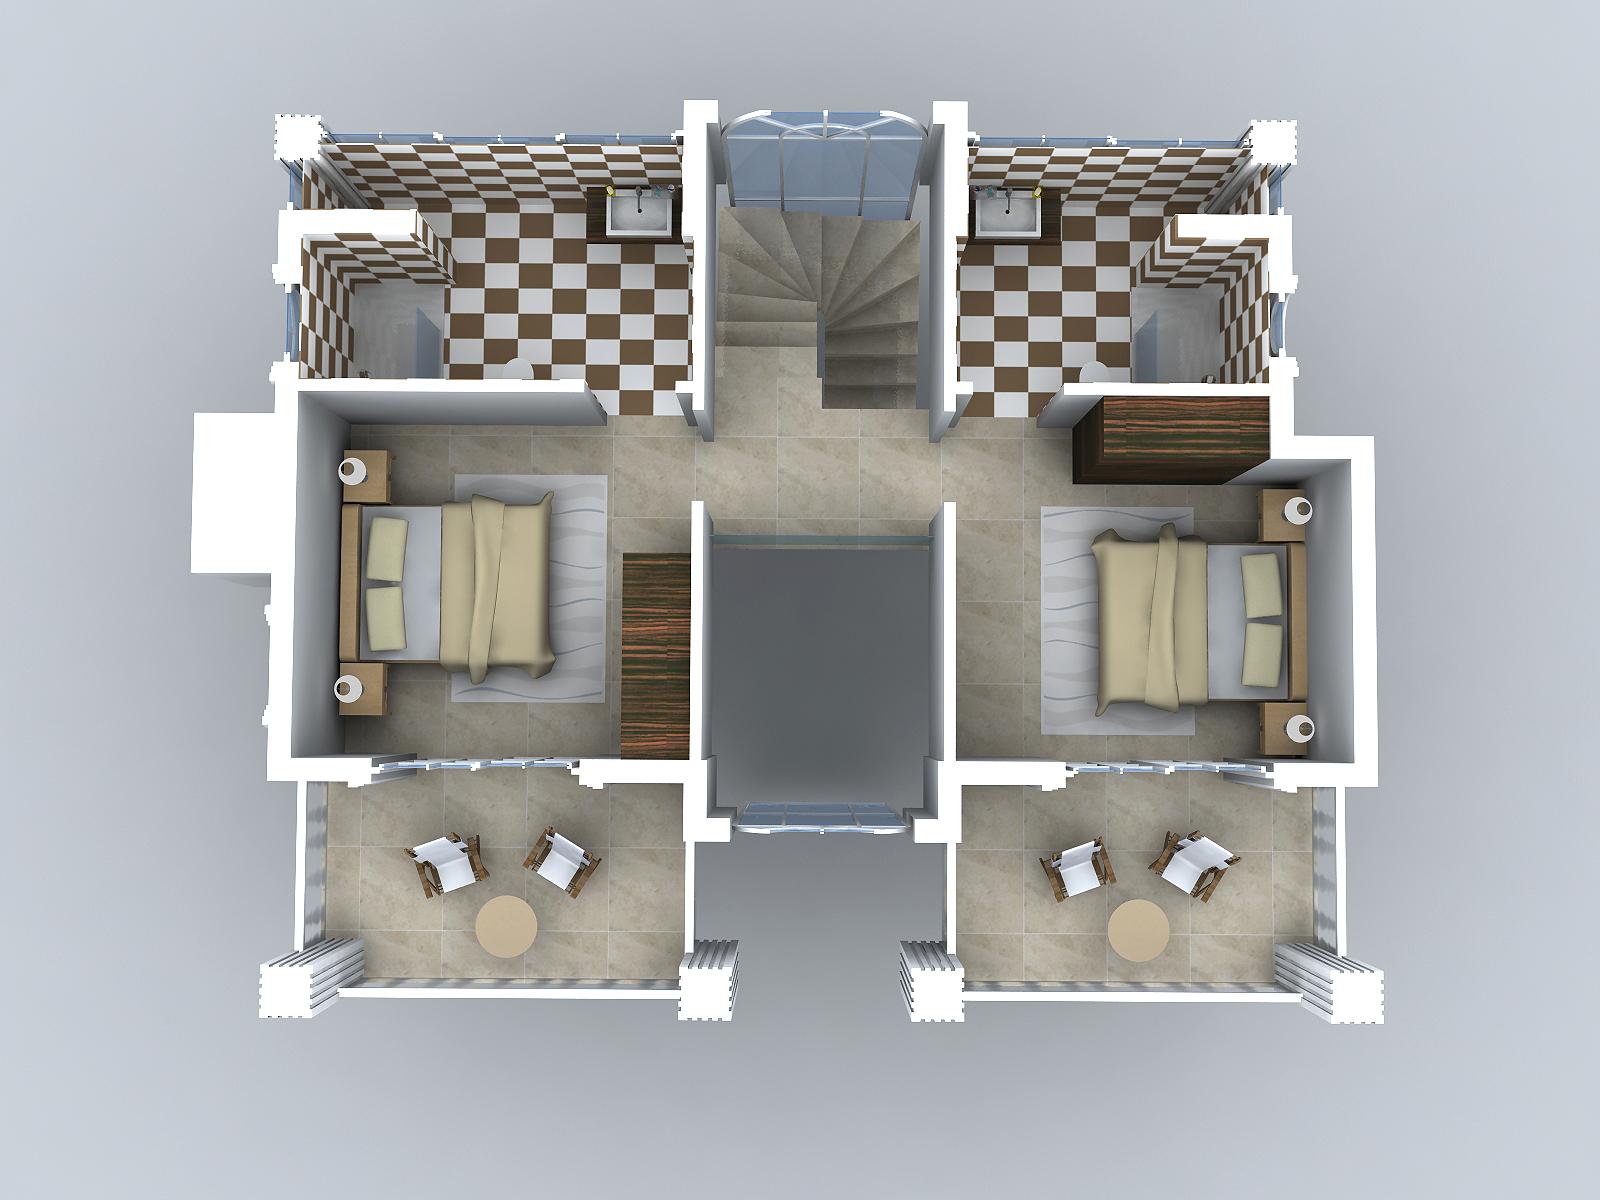 11. First Floor Plan